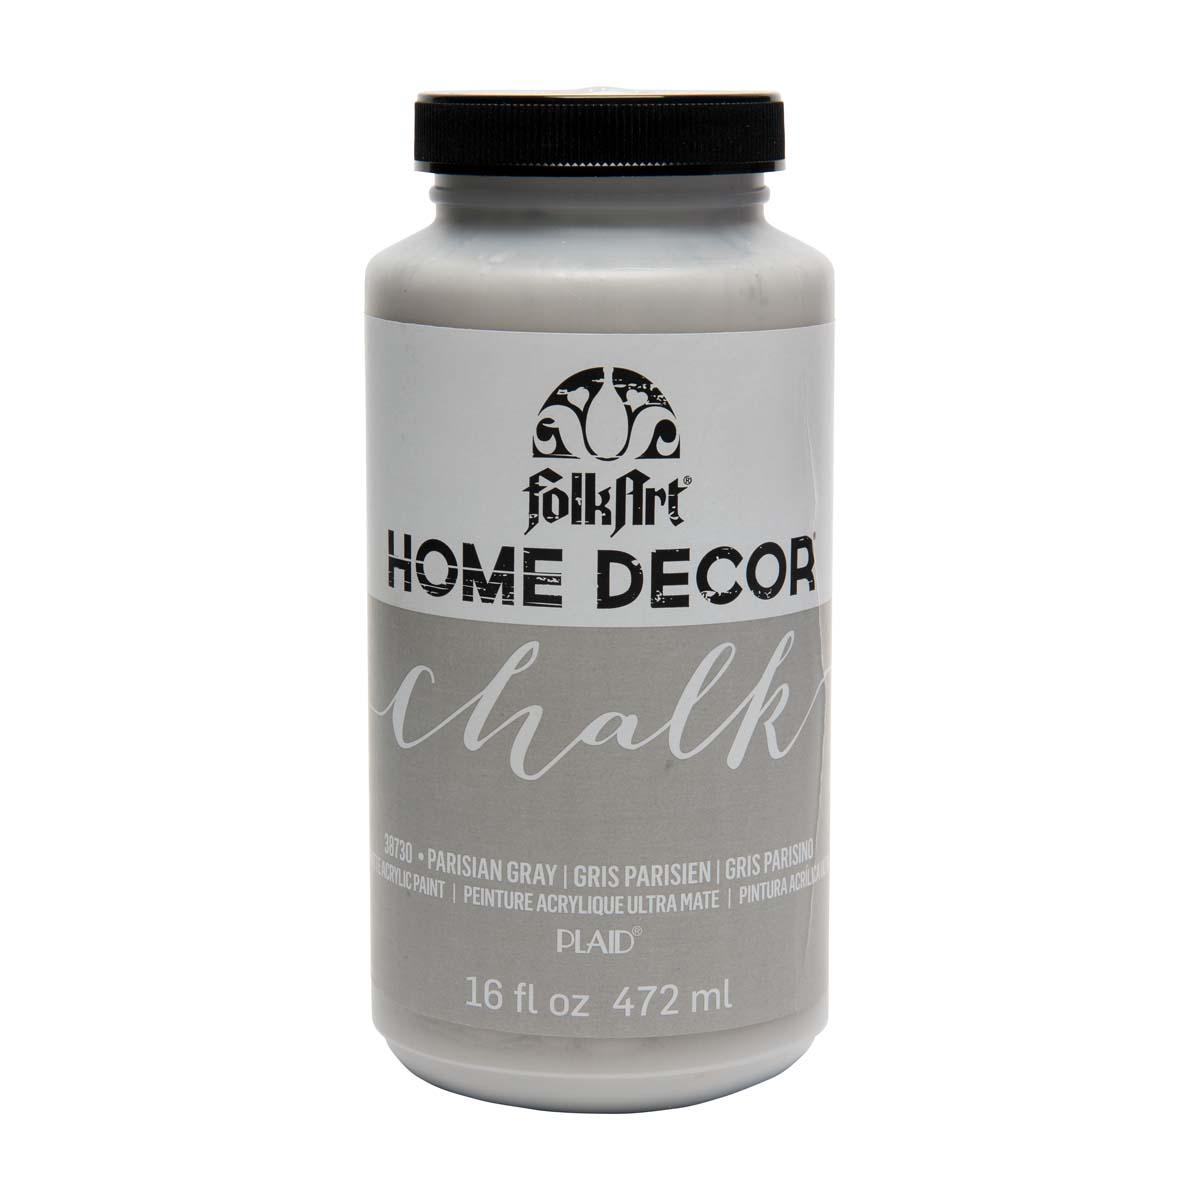 FolkArt ® Home Decor™ Chalk - Parisian Grey, 16 oz.